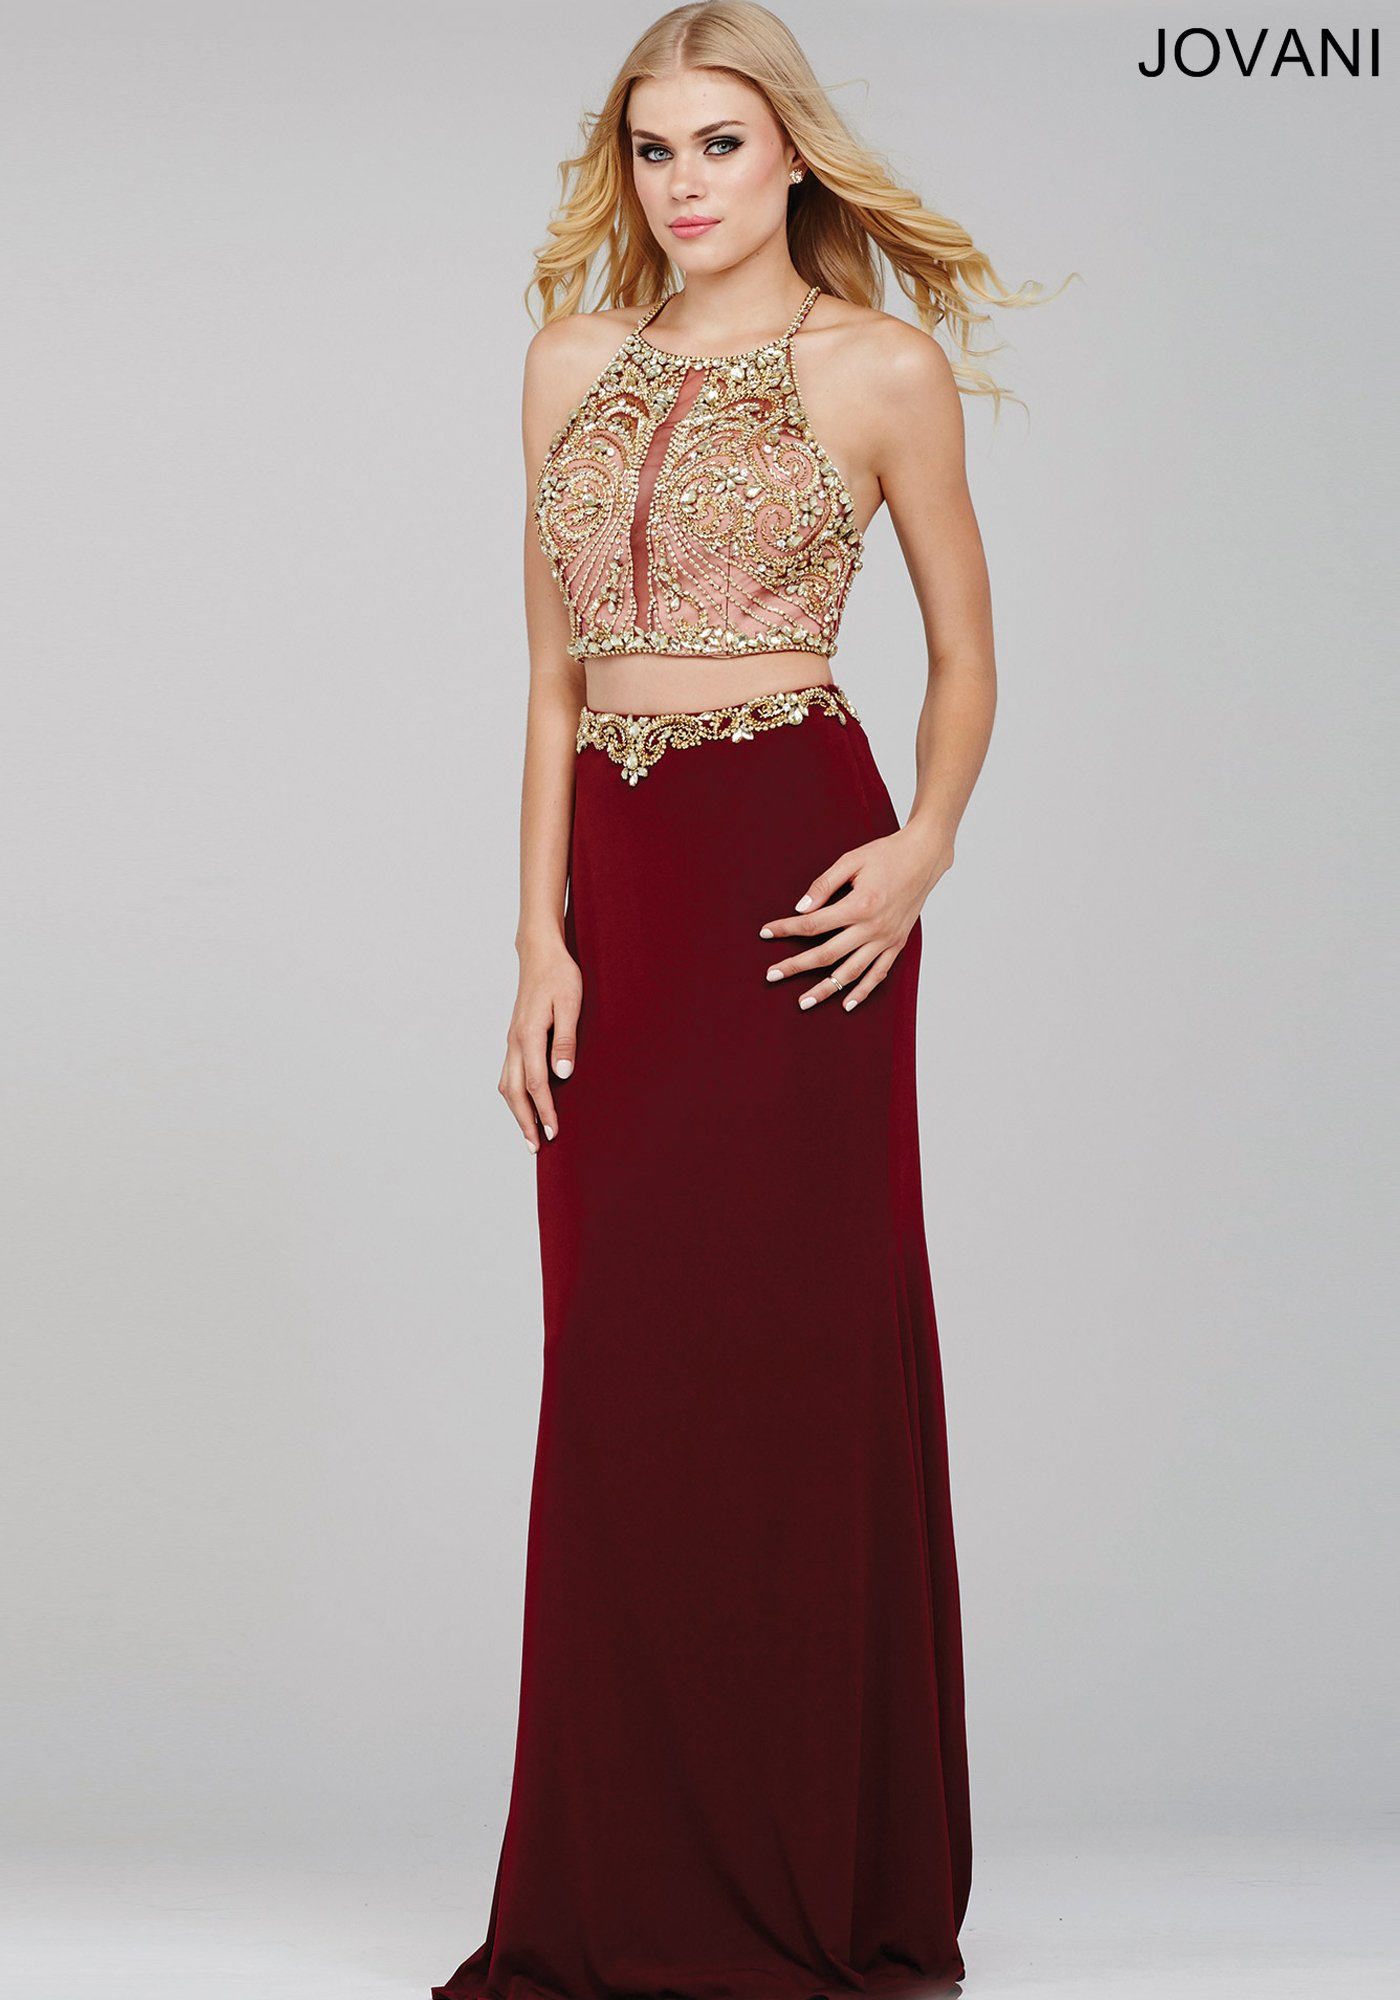 Fullsize Of Two Piece Dresses